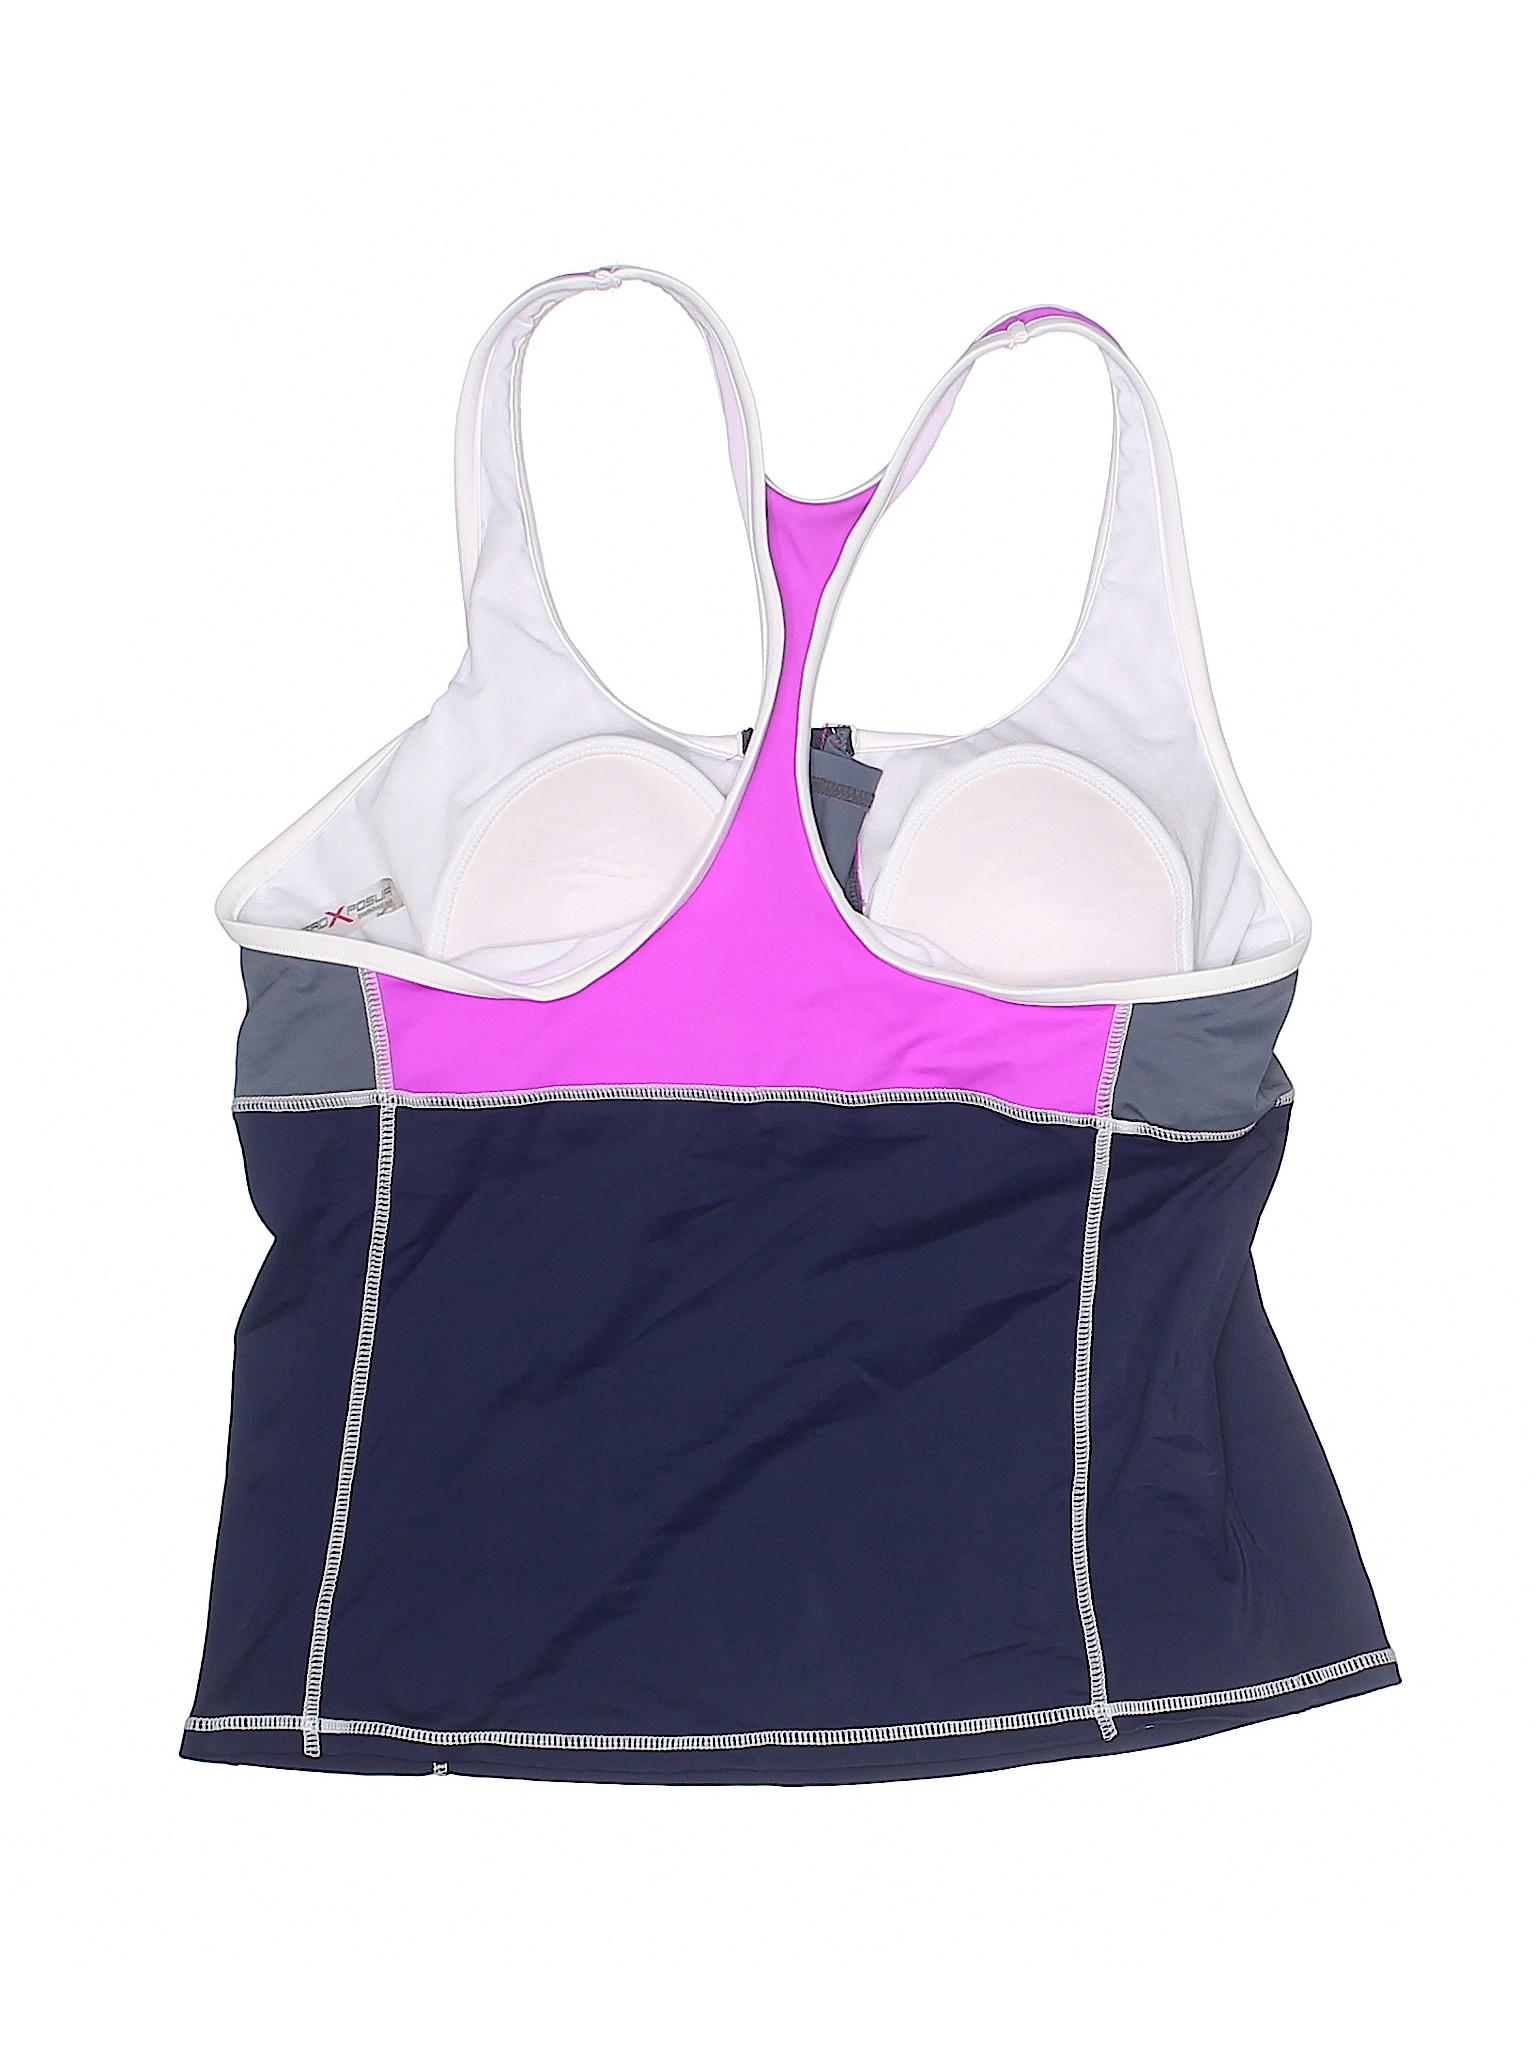 Top ZeroXposur Boutique ZeroXposur ZeroXposur Swimsuit Top Boutique Boutique Swimsuit Y5wvxgqa